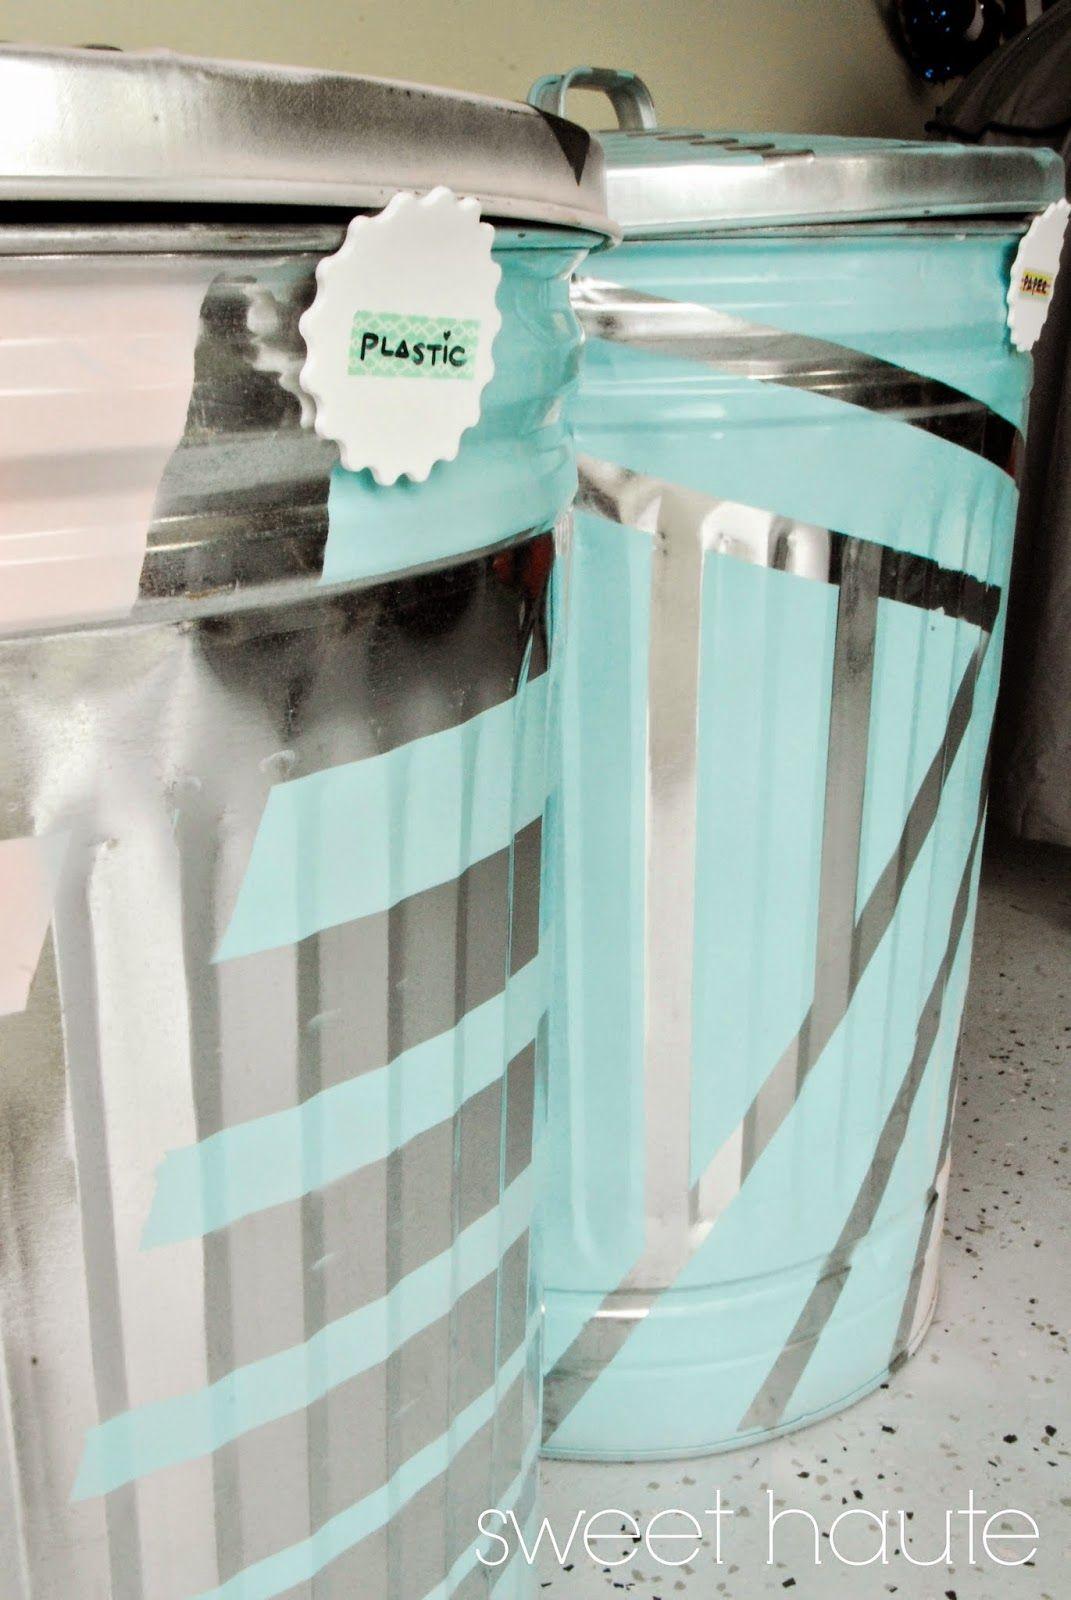 DIY Outdoor Organization: Recycle Bins SWEET HAUTE lowes creator ...